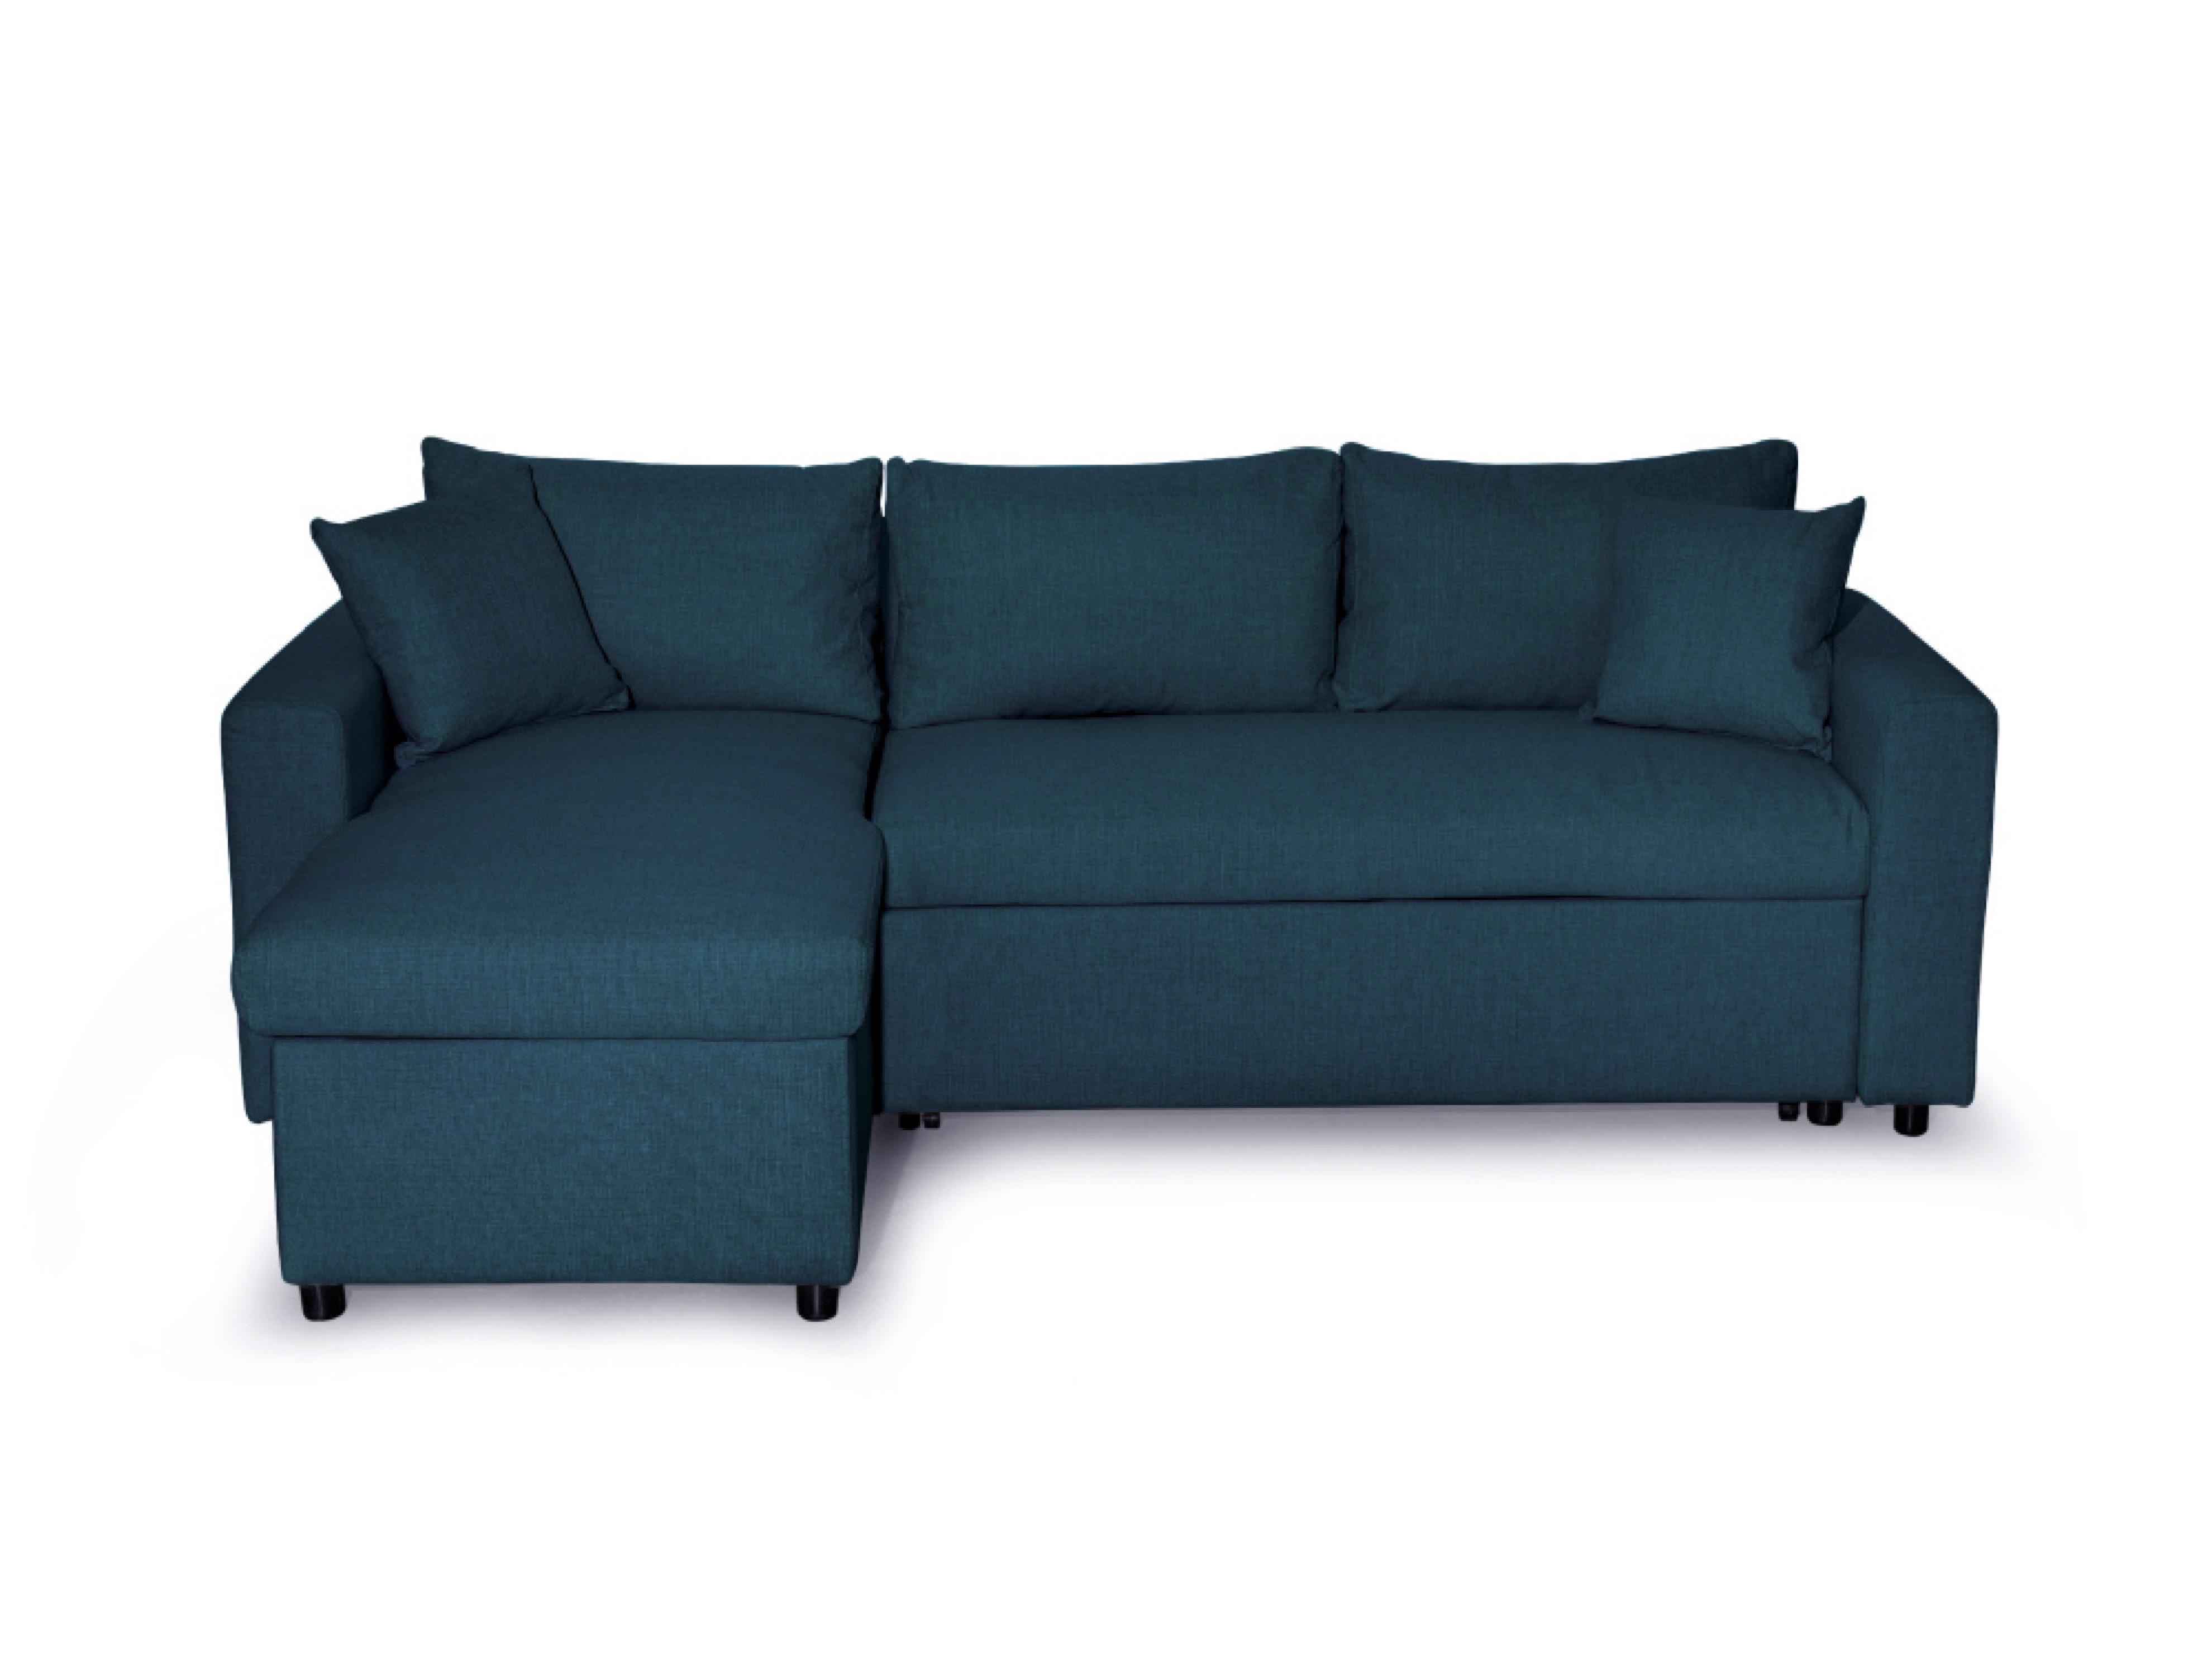 Canapé d'angle réversible convertible avec coffre en tissu bleu canard